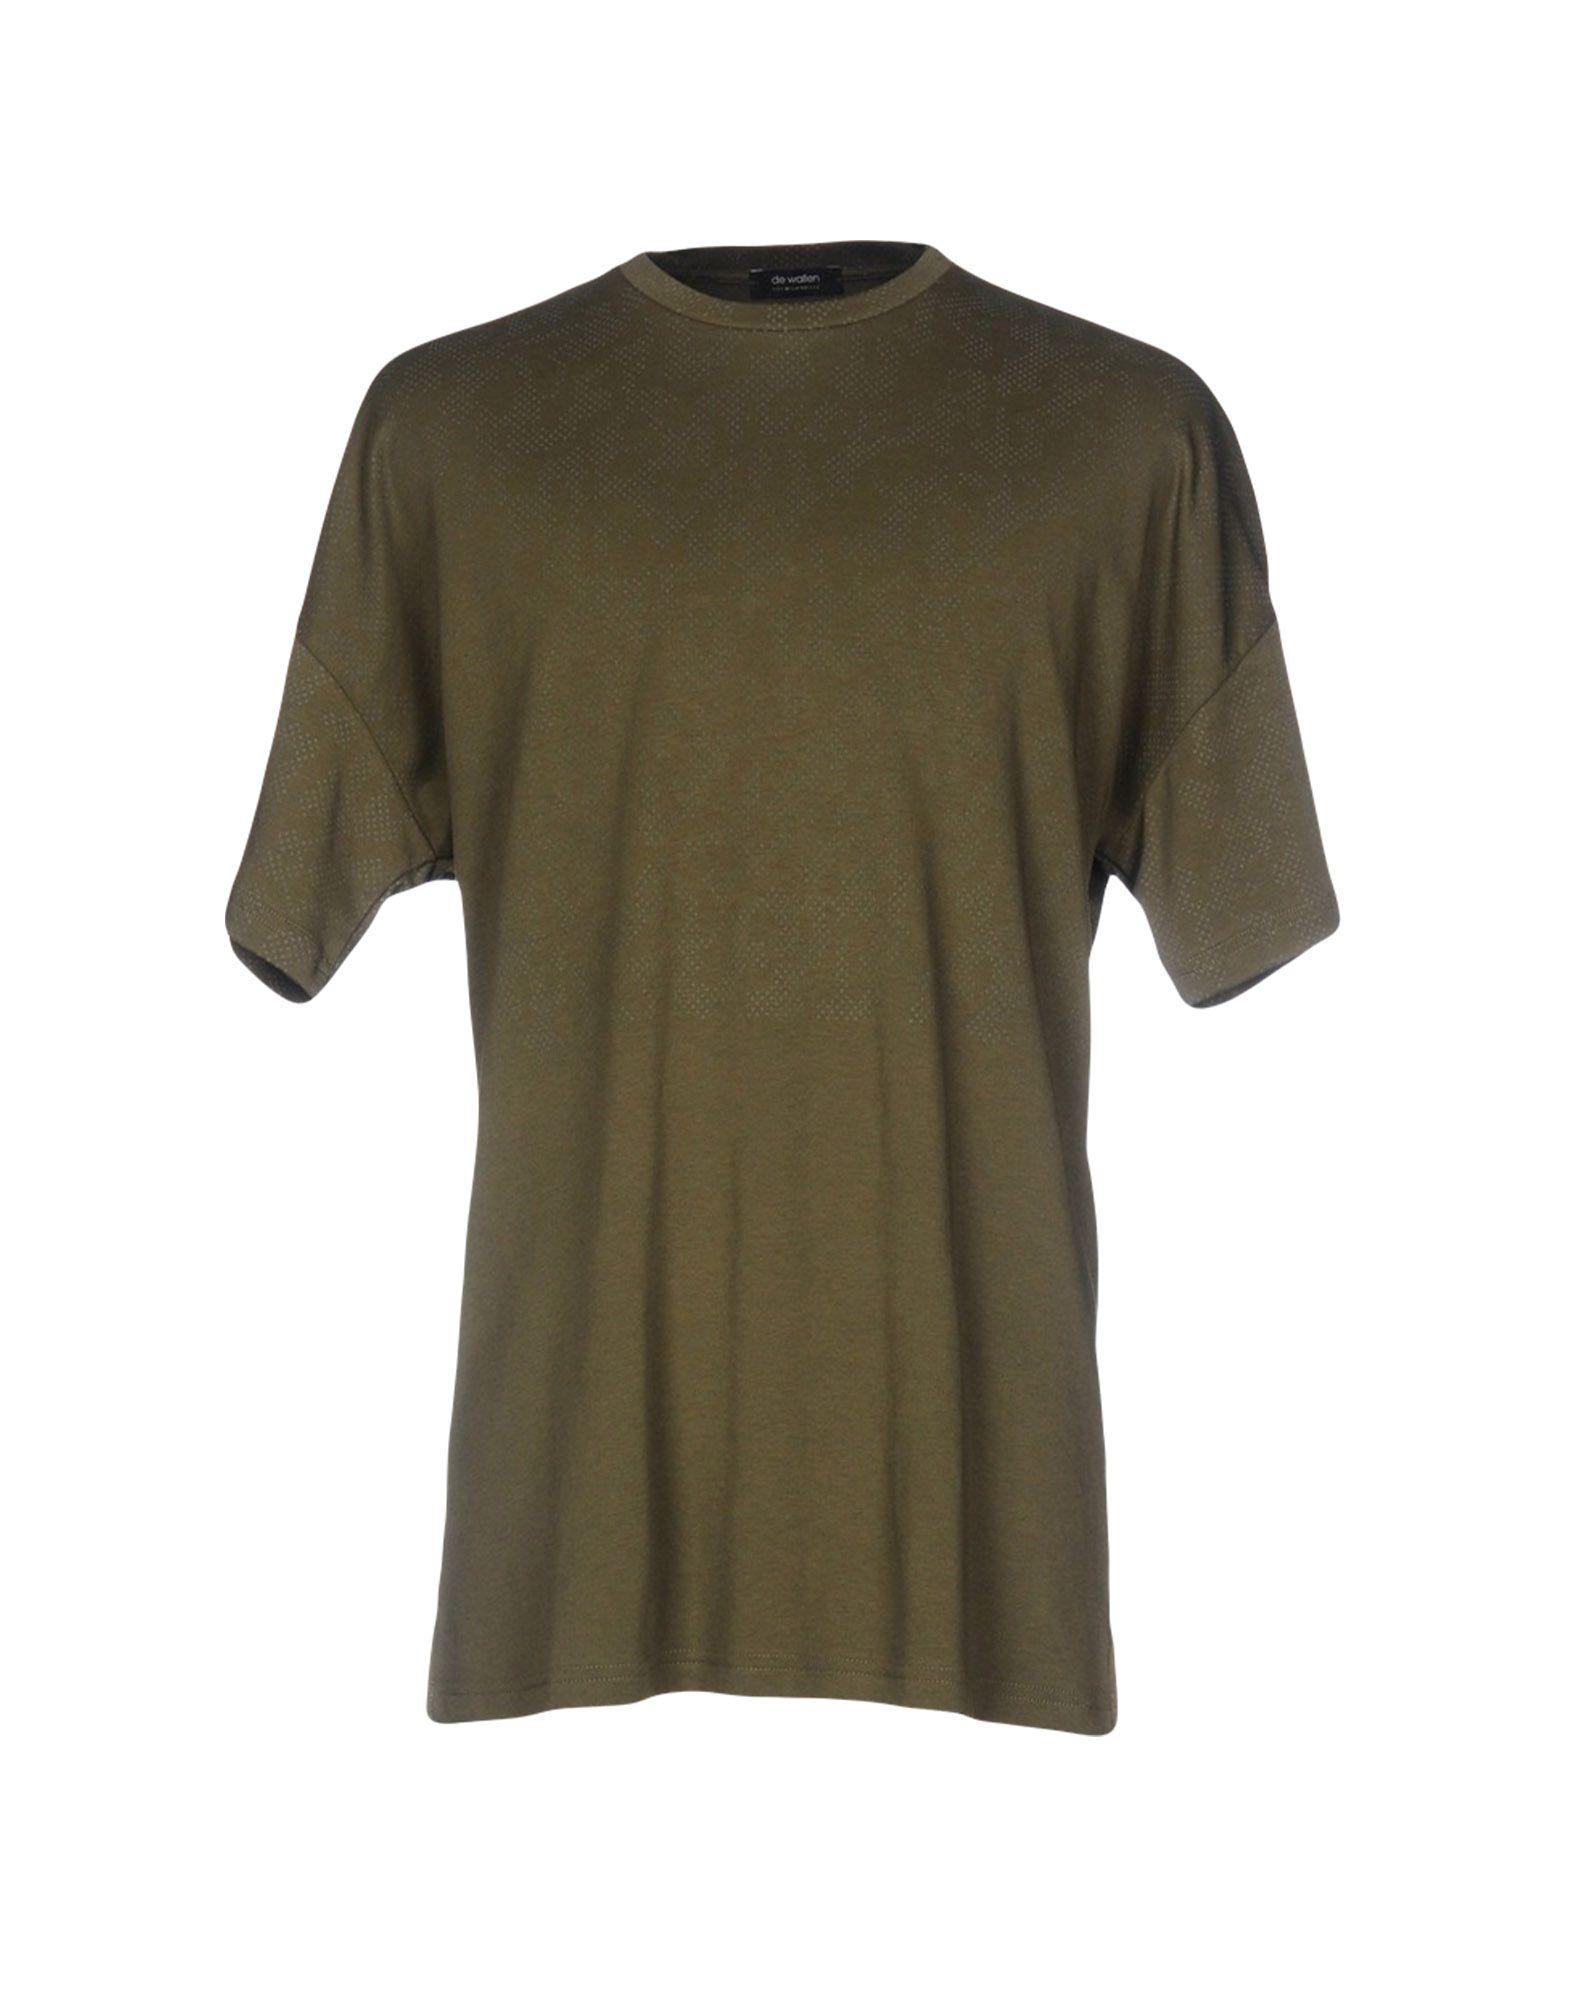 DE WALLEN T-Shirt in Military Green